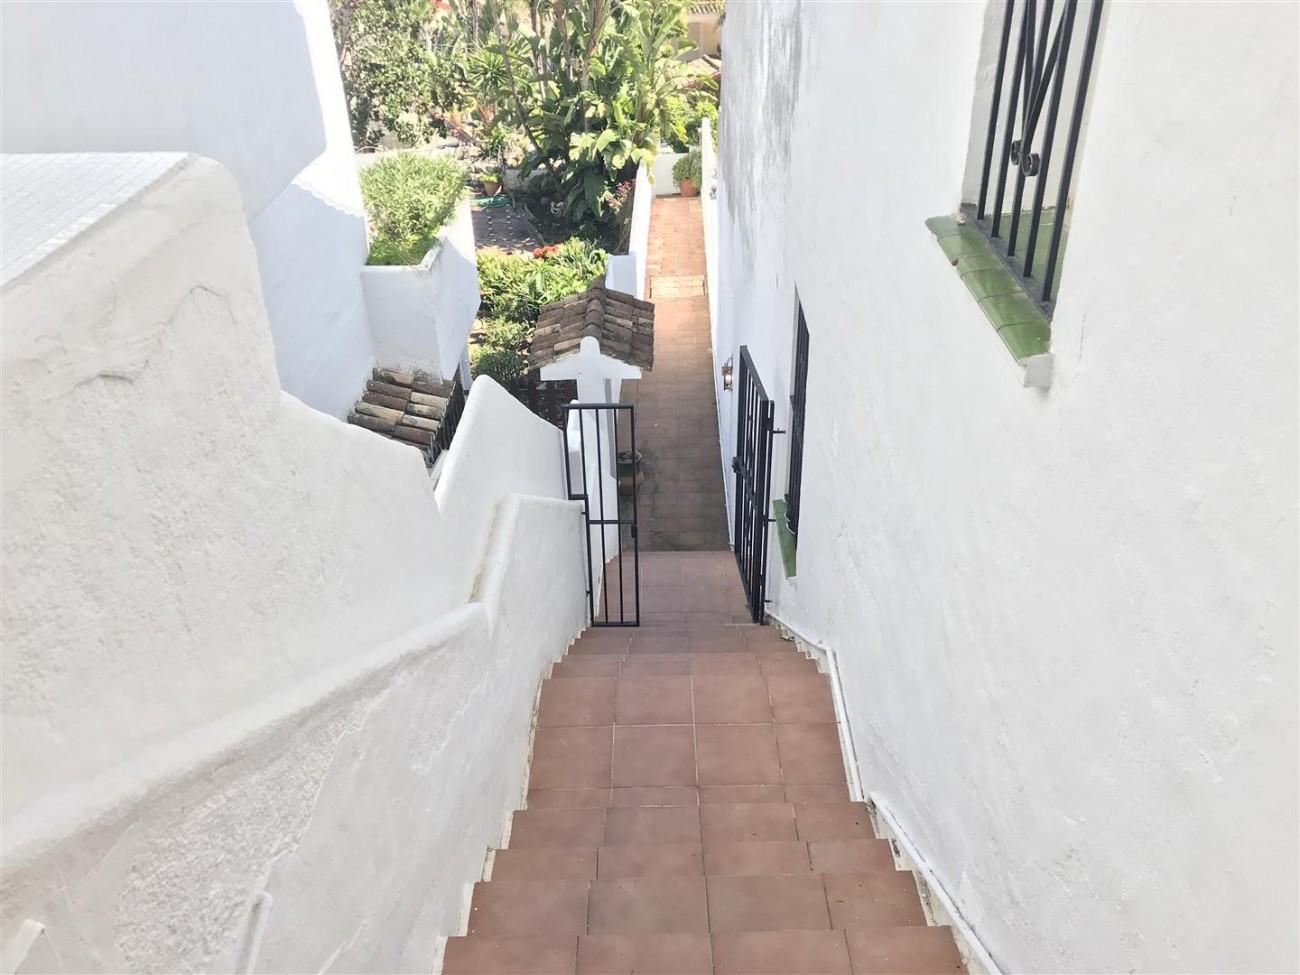 Townhouse for sale cloe to Puerto Banus Marbella Spain (1)